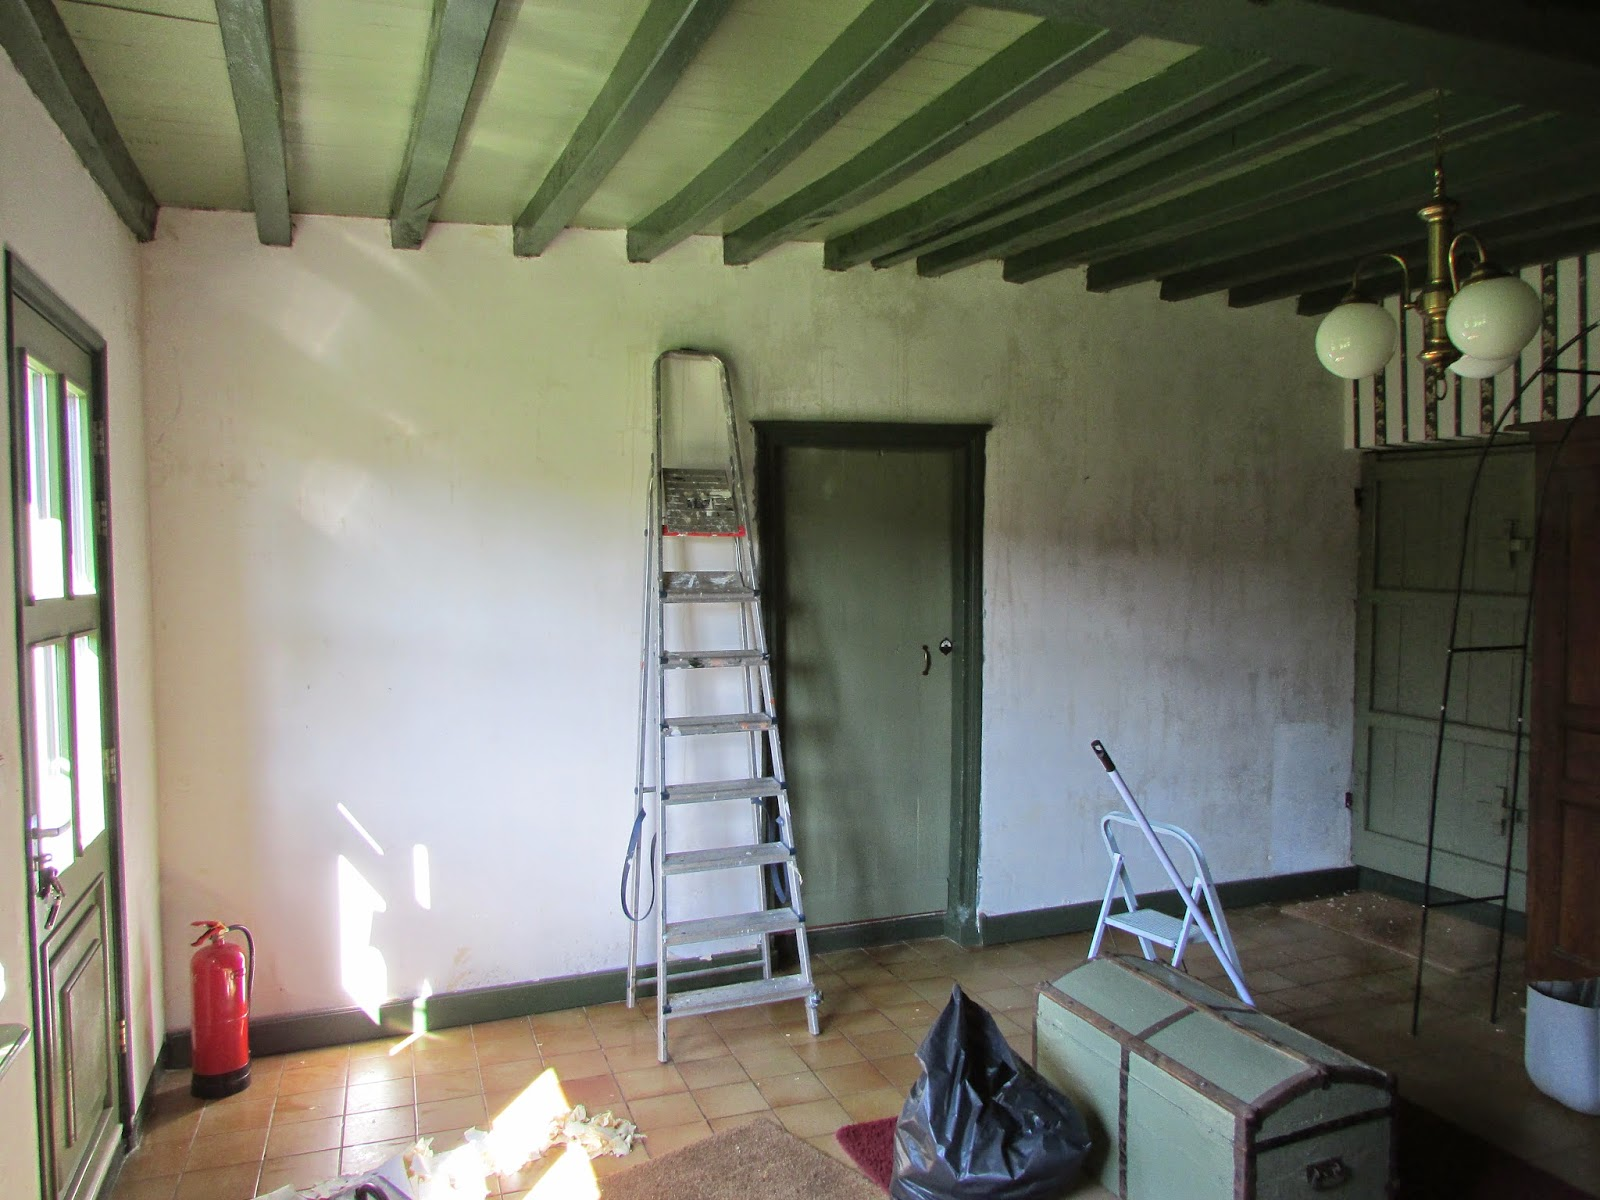 39 la vieille ferme 39 april 2014 - Winkel balkon leroy merlin ...